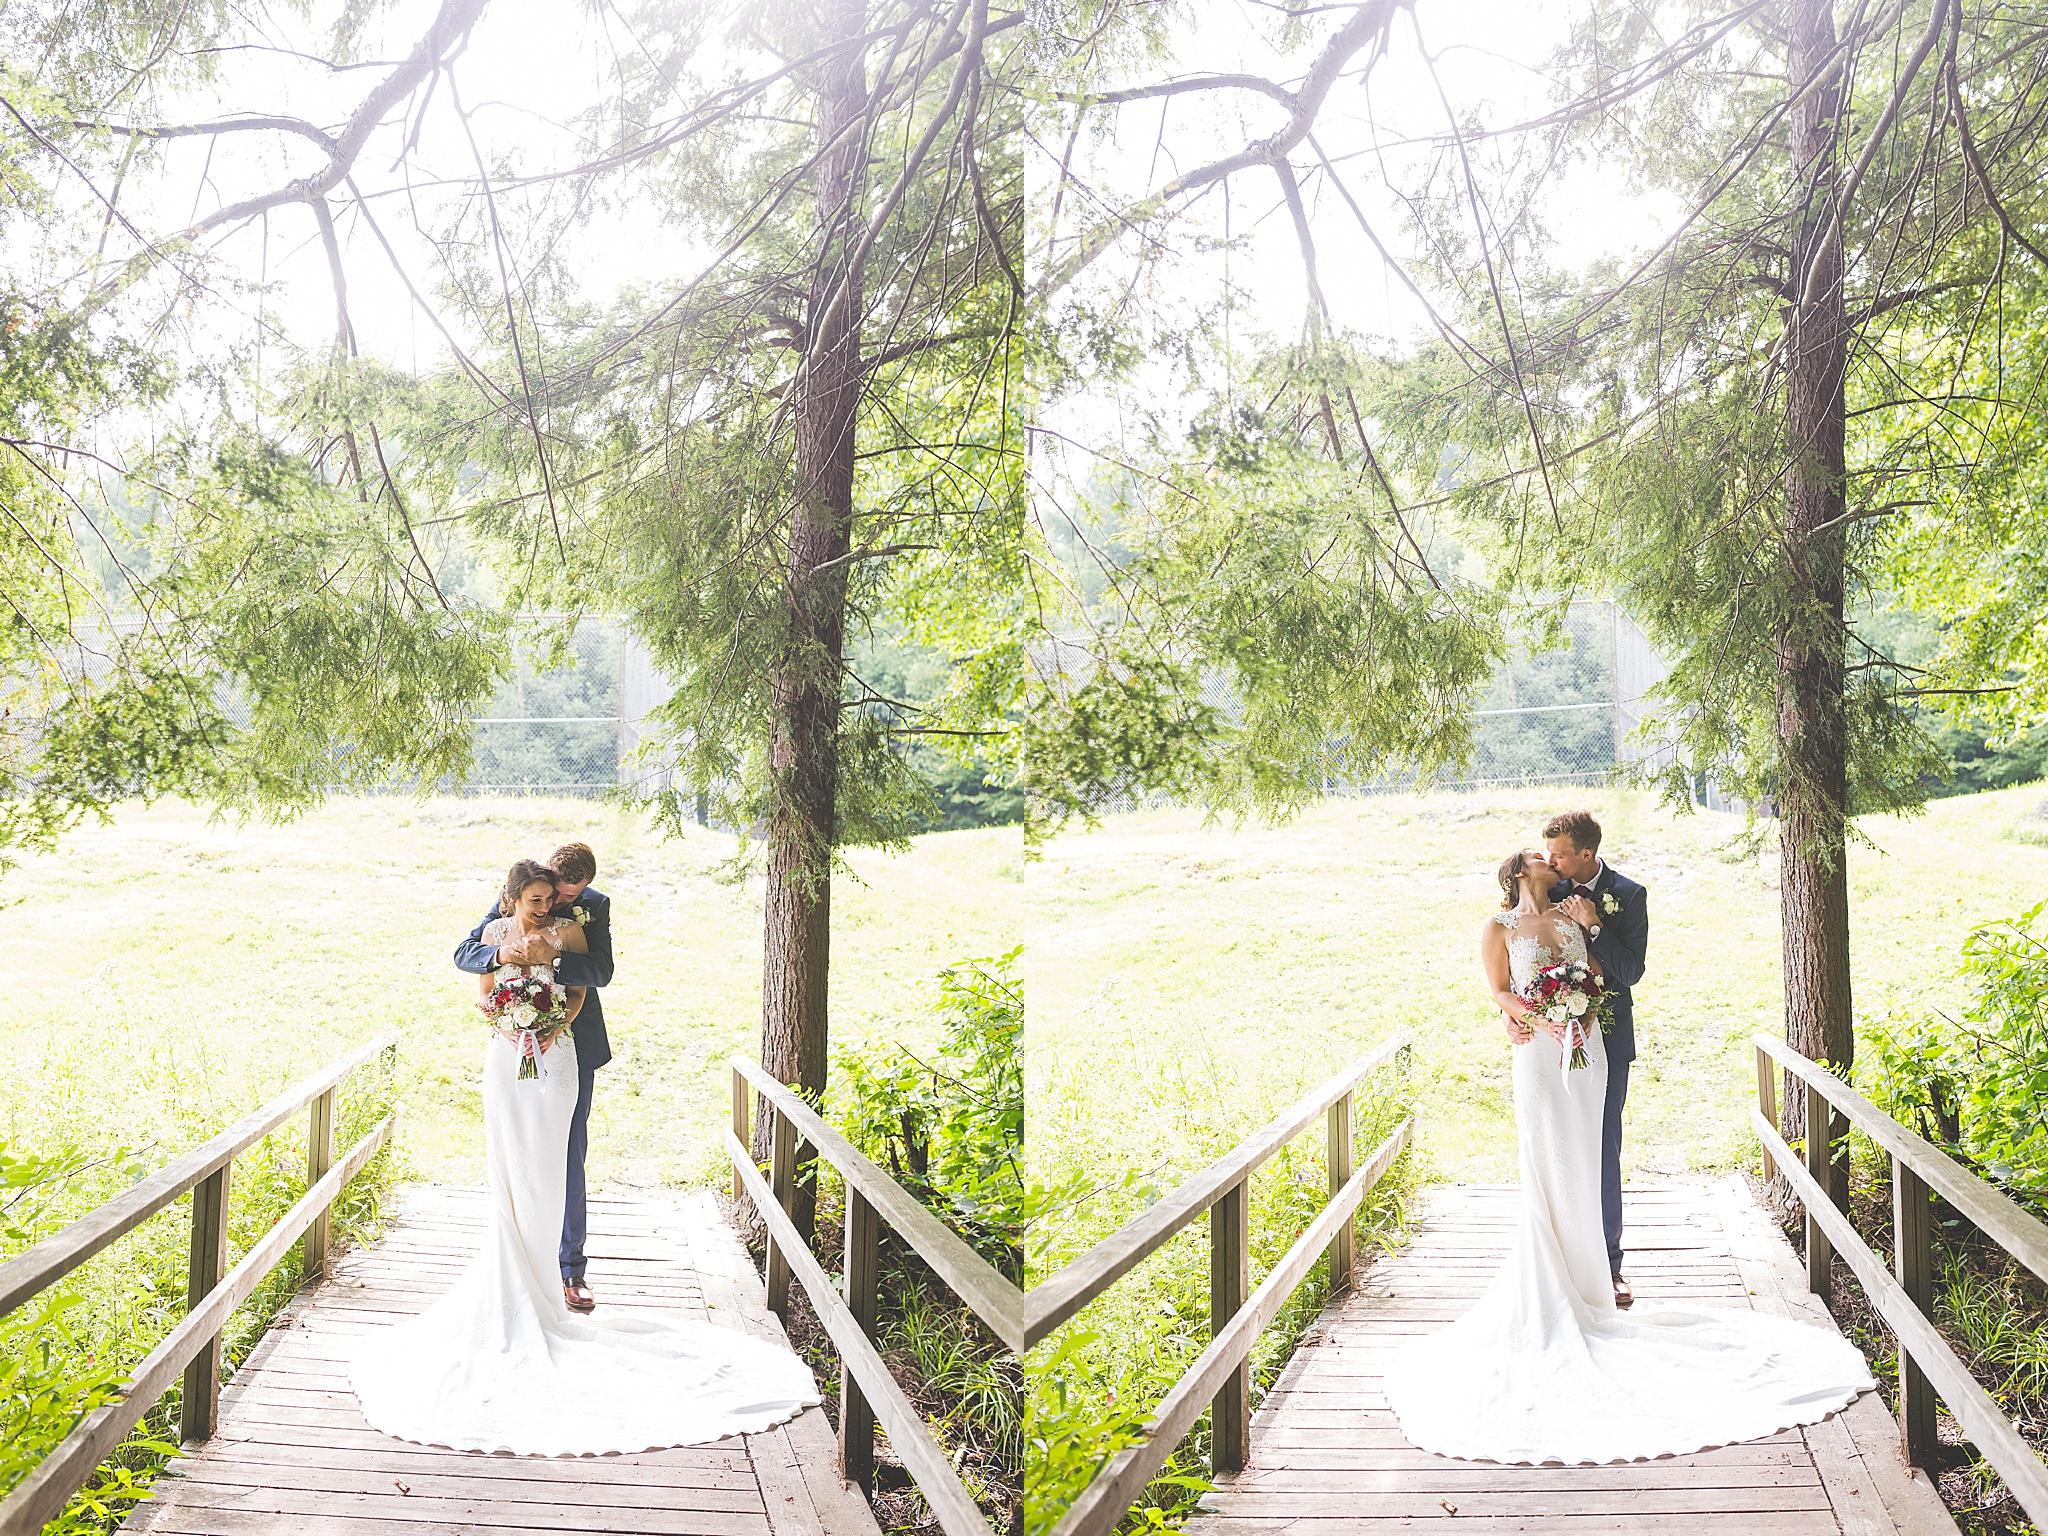 Albany_Wedding_Photographer_7494.jpg